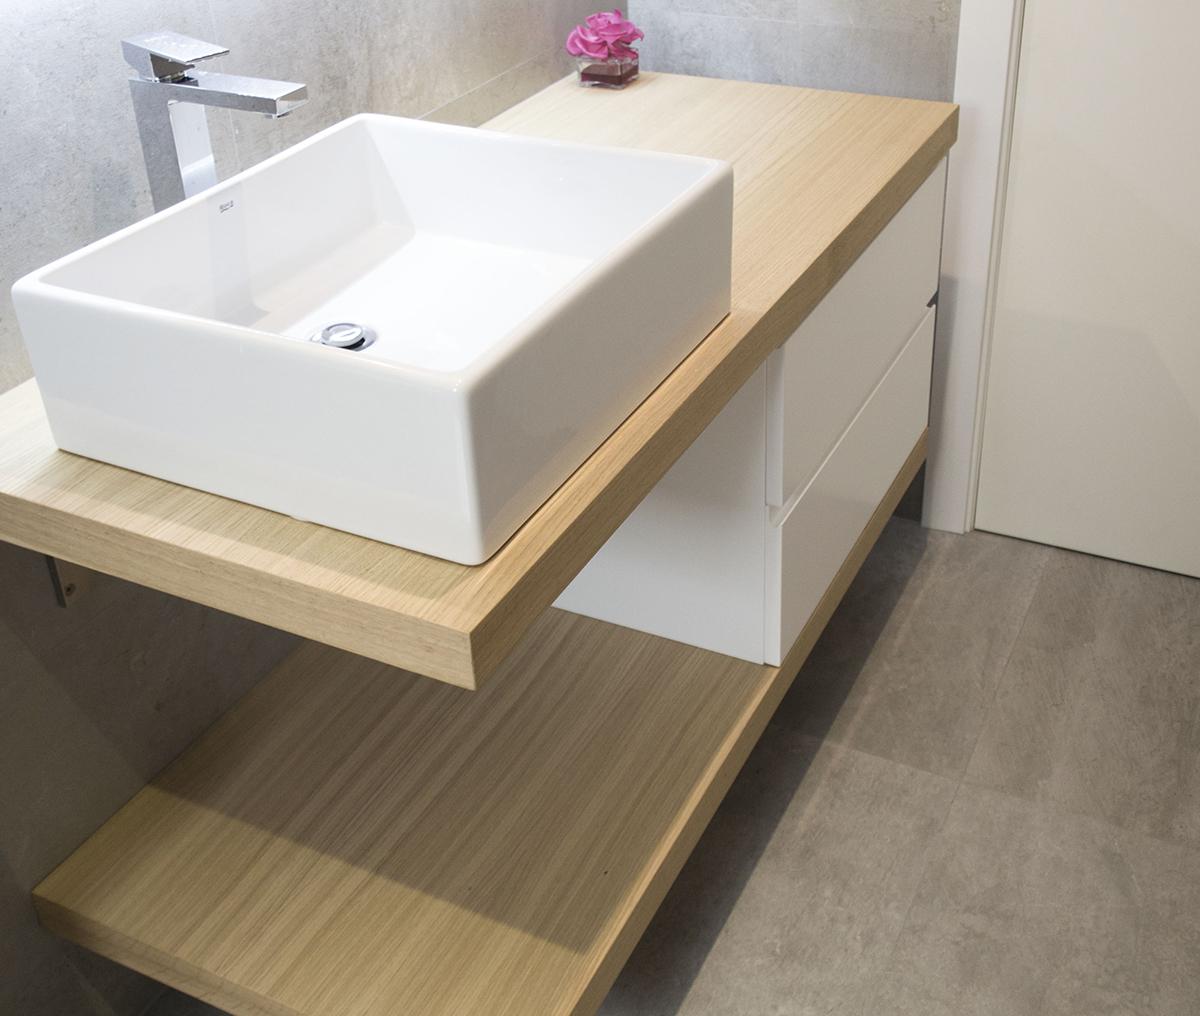 mueble de ba o a medida con encimera de madera mb concept